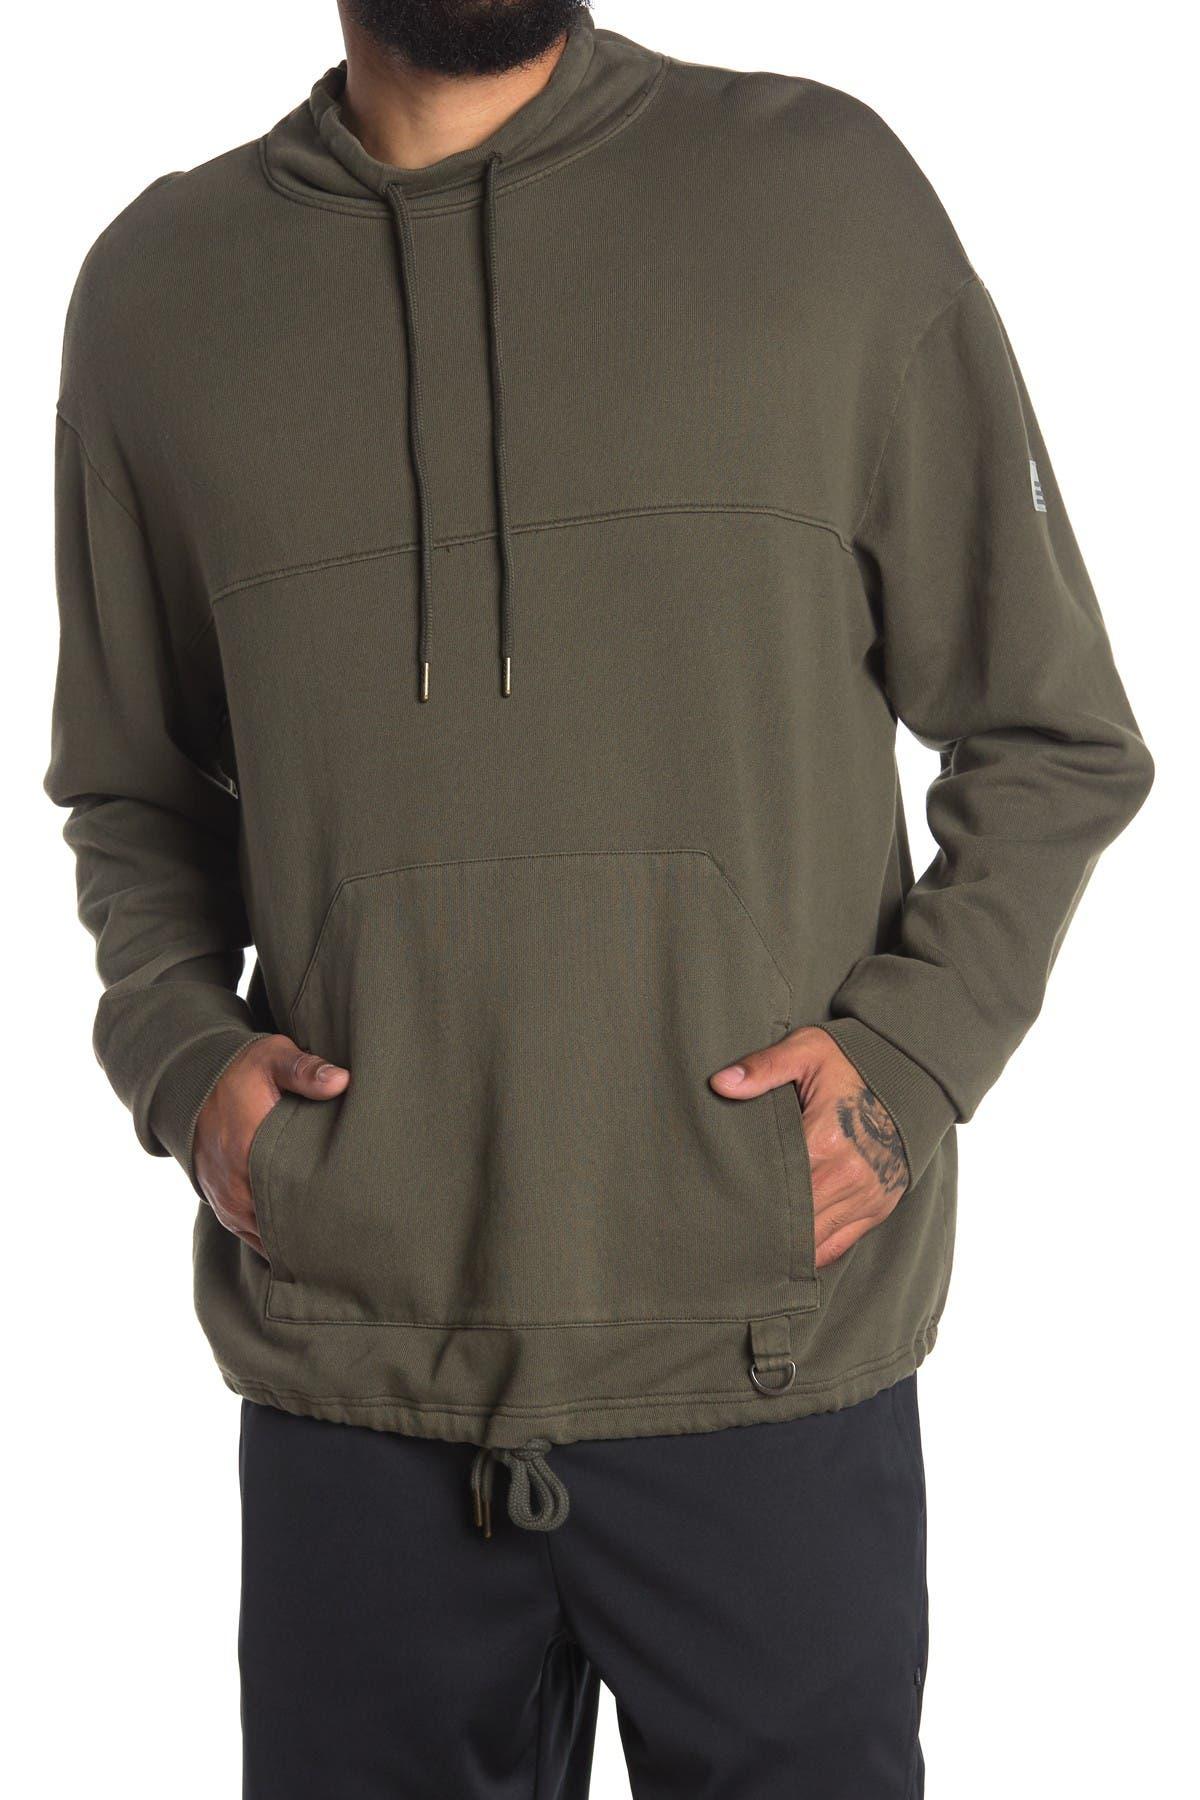 Image of Oakley Workwear Track Fleece Sweatshirt